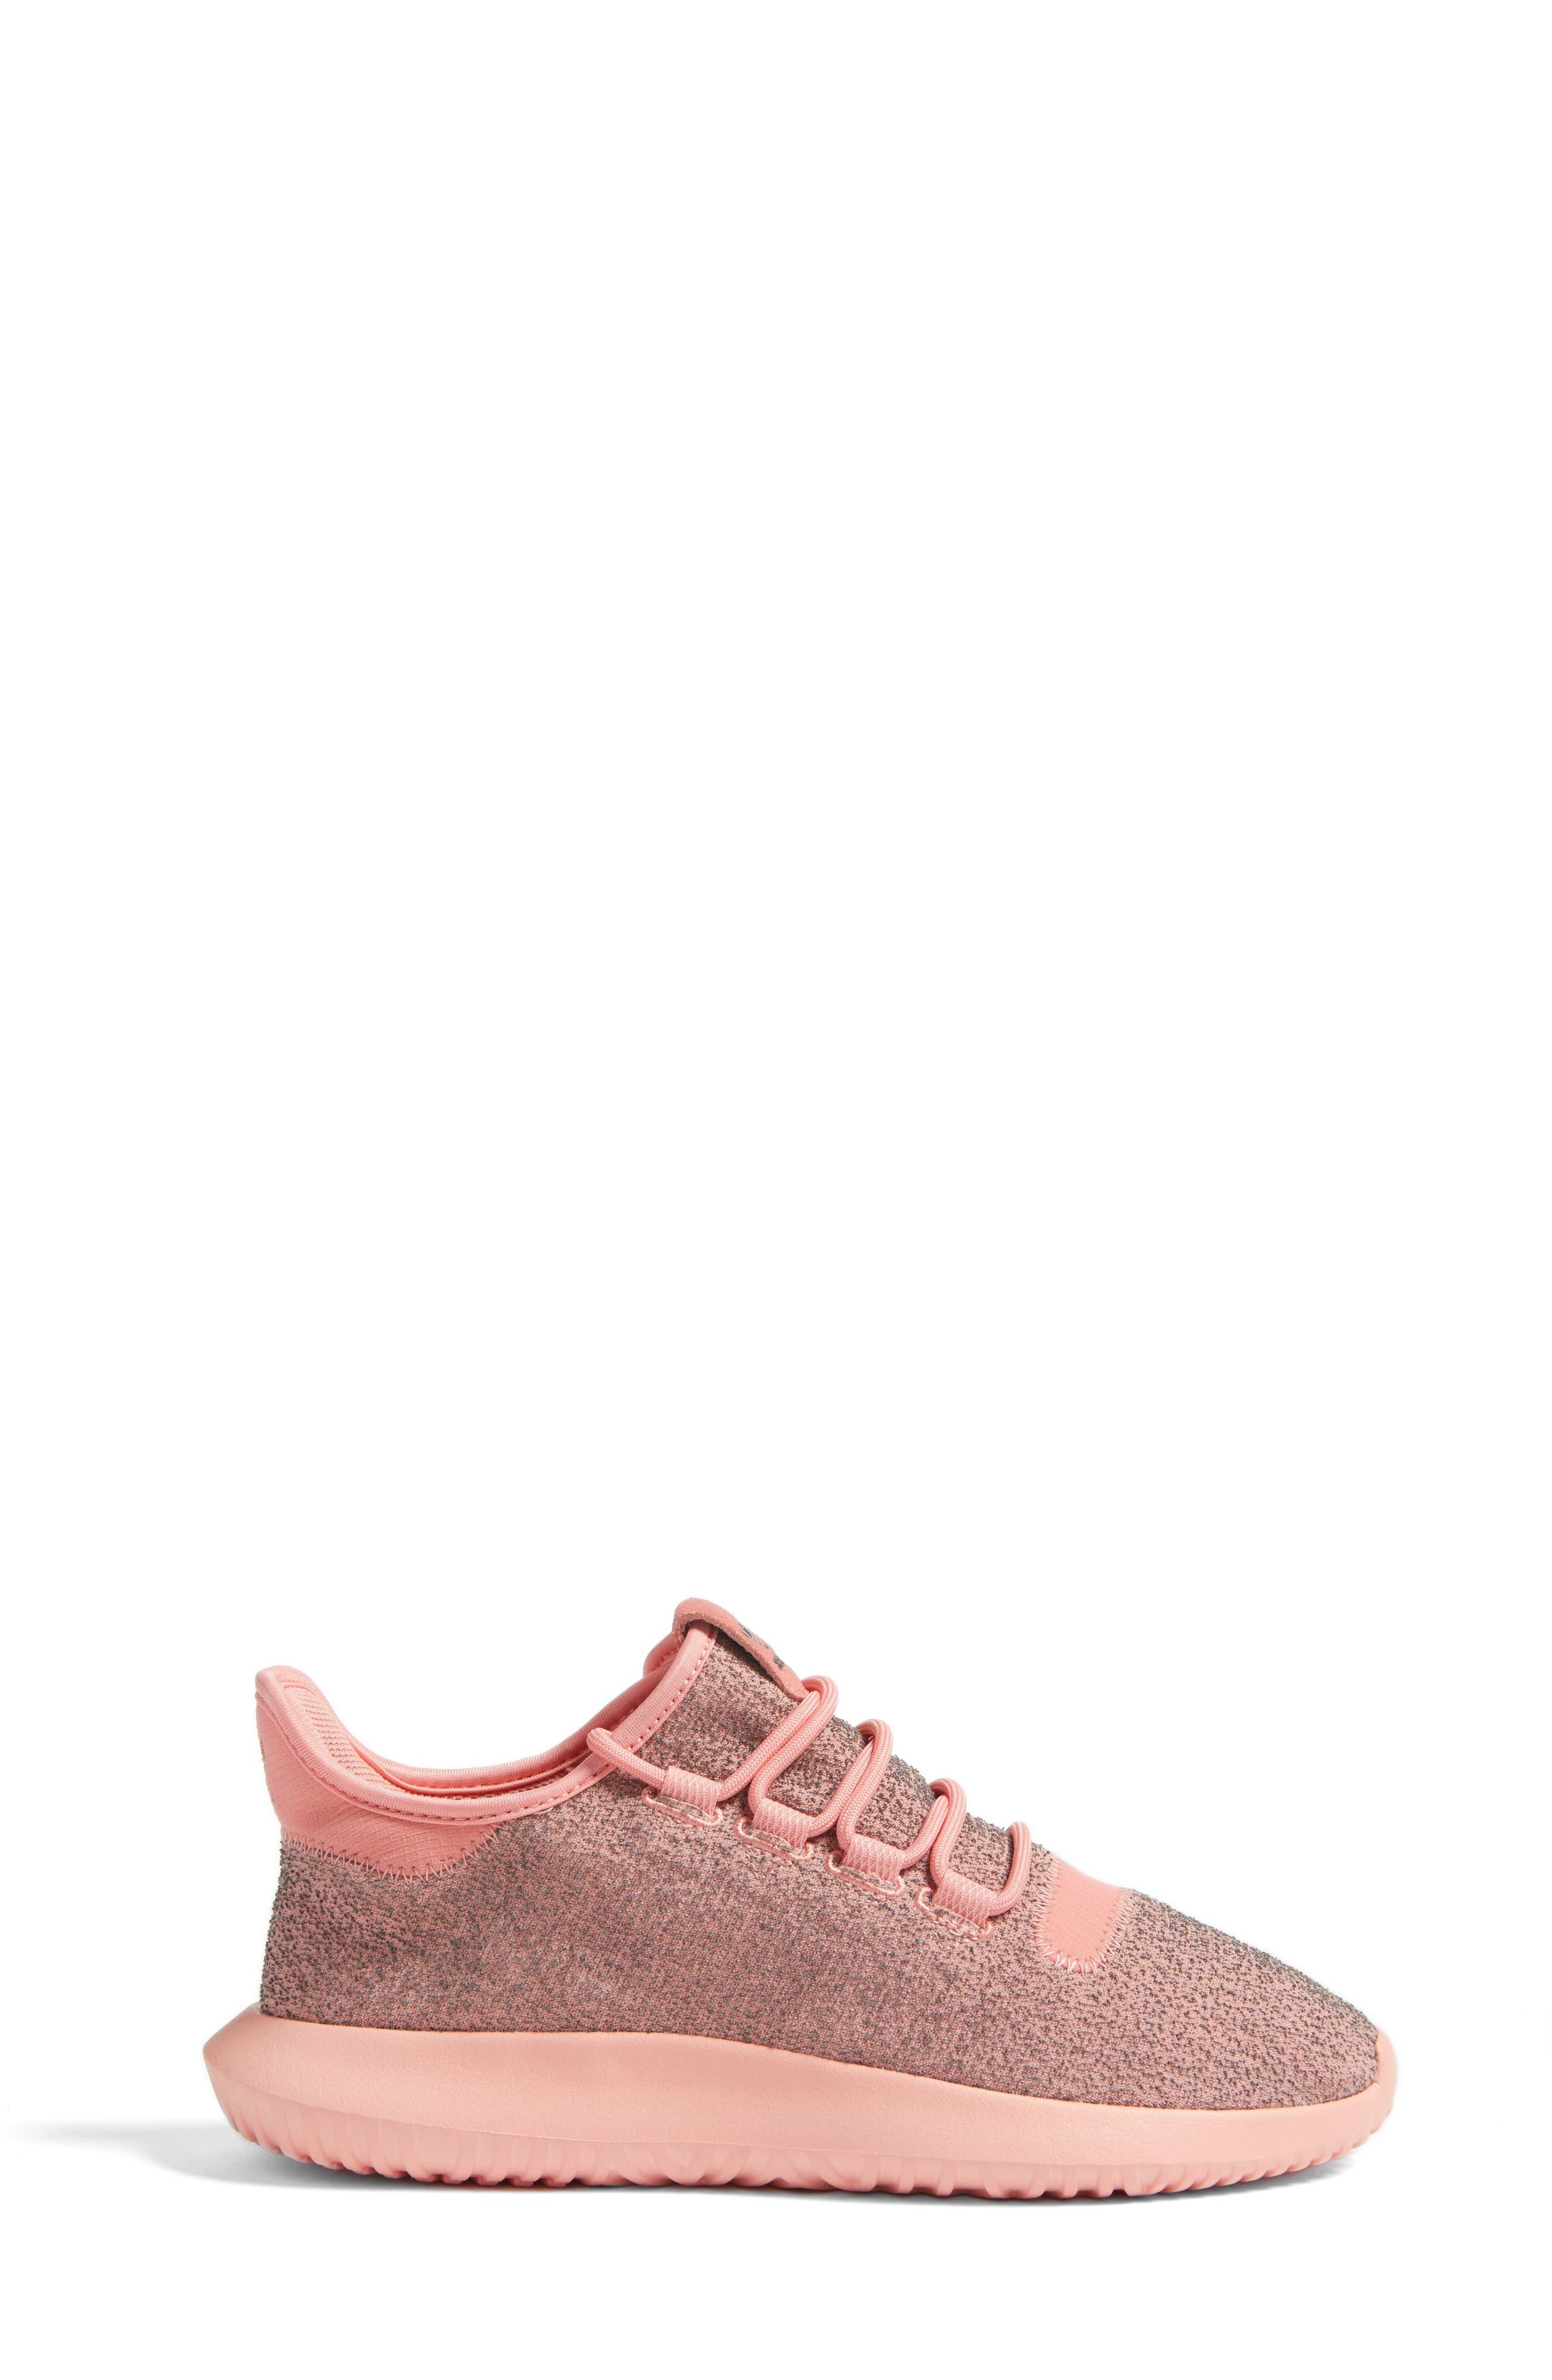 Tubular Shadow Sneaker,                             Alternate thumbnail 3, color,                             Raw Pink/ Raw Pink